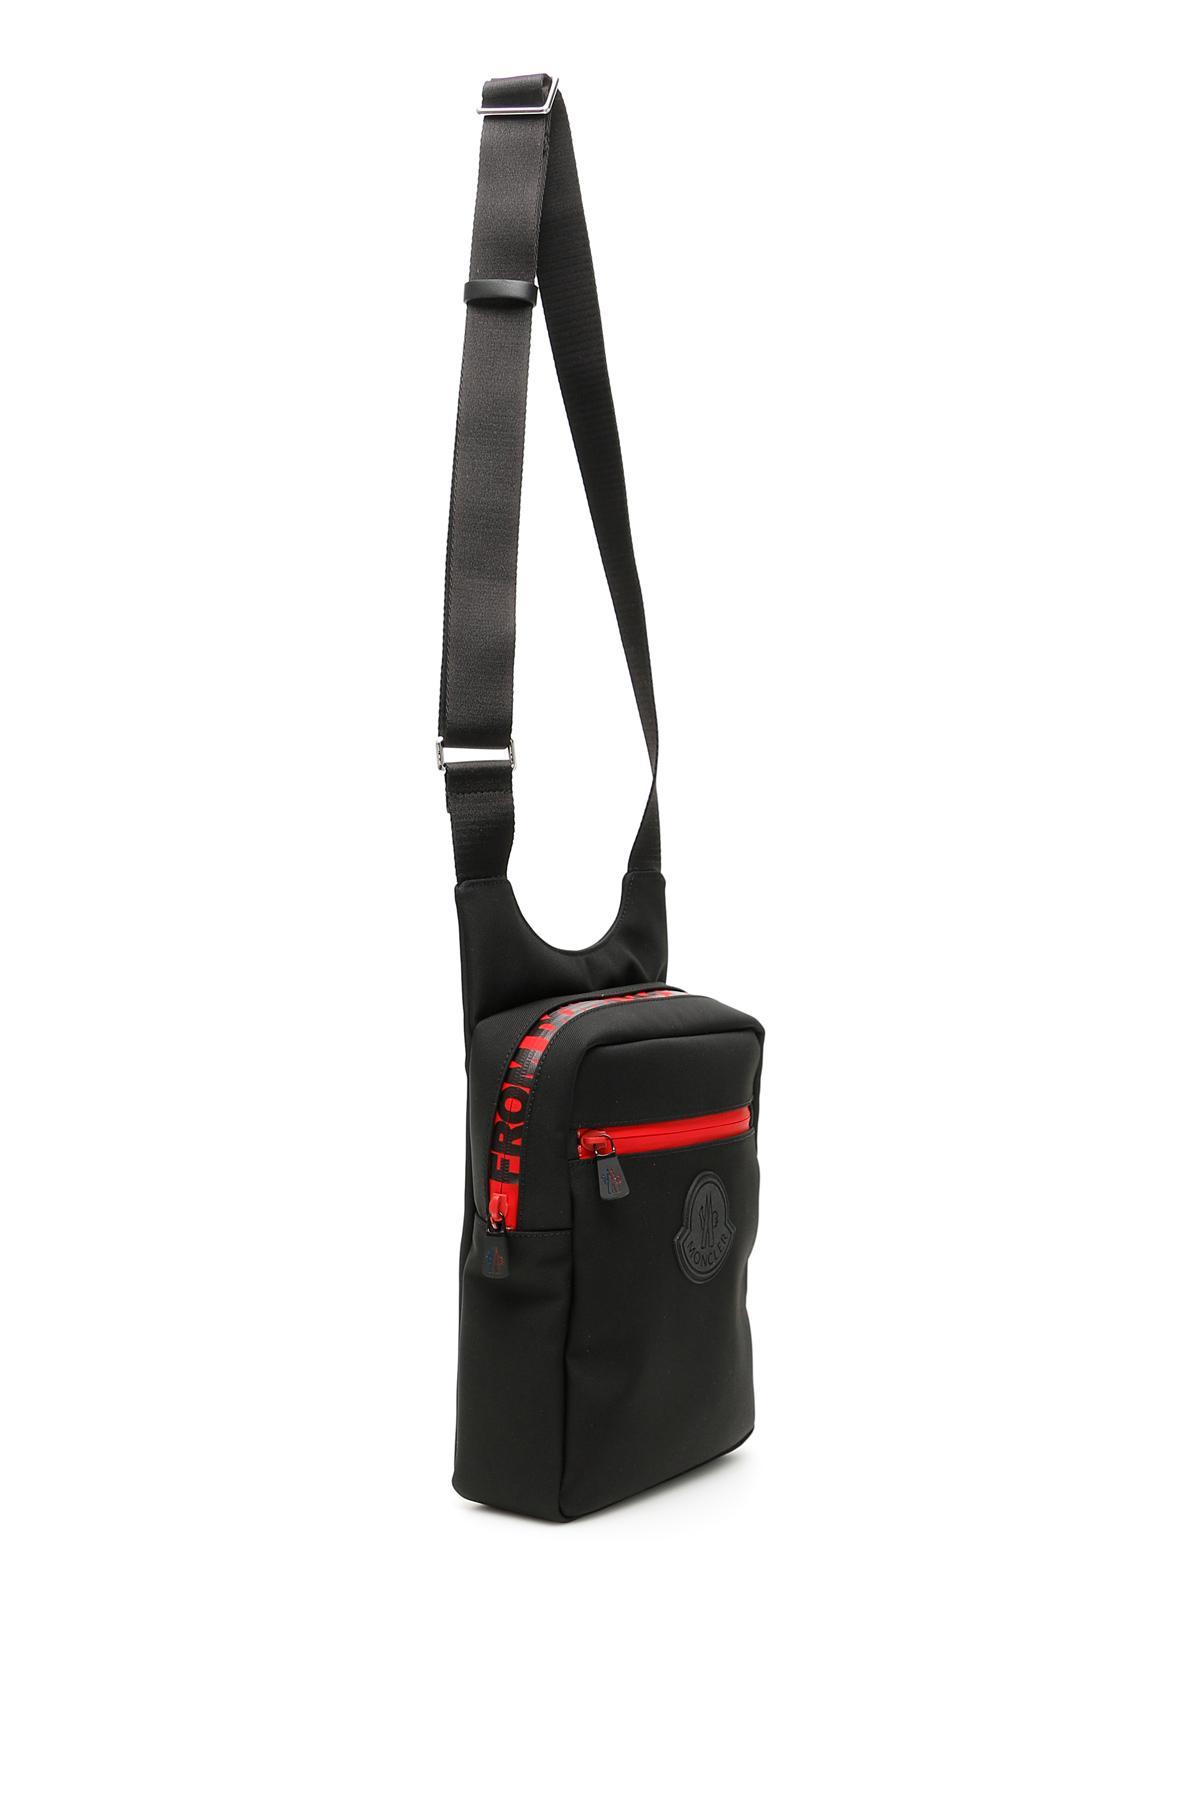 fcd244cae69 Moncler Pascal Messenger Bag in Black for Men - Lyst